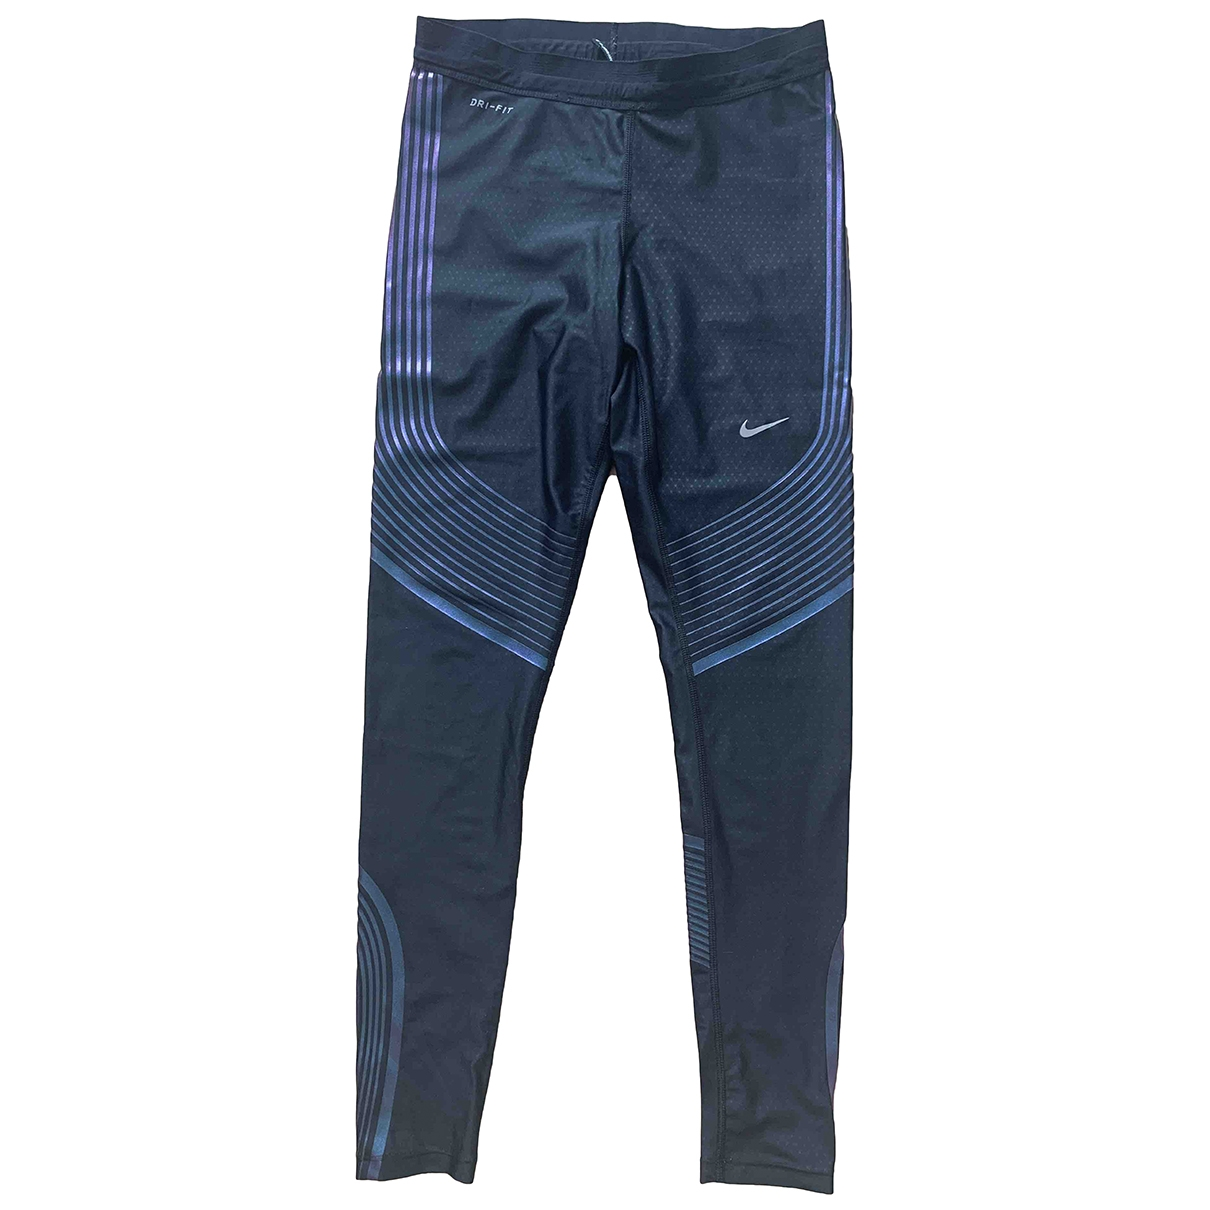 Nike \N Black Trousers for Women S International